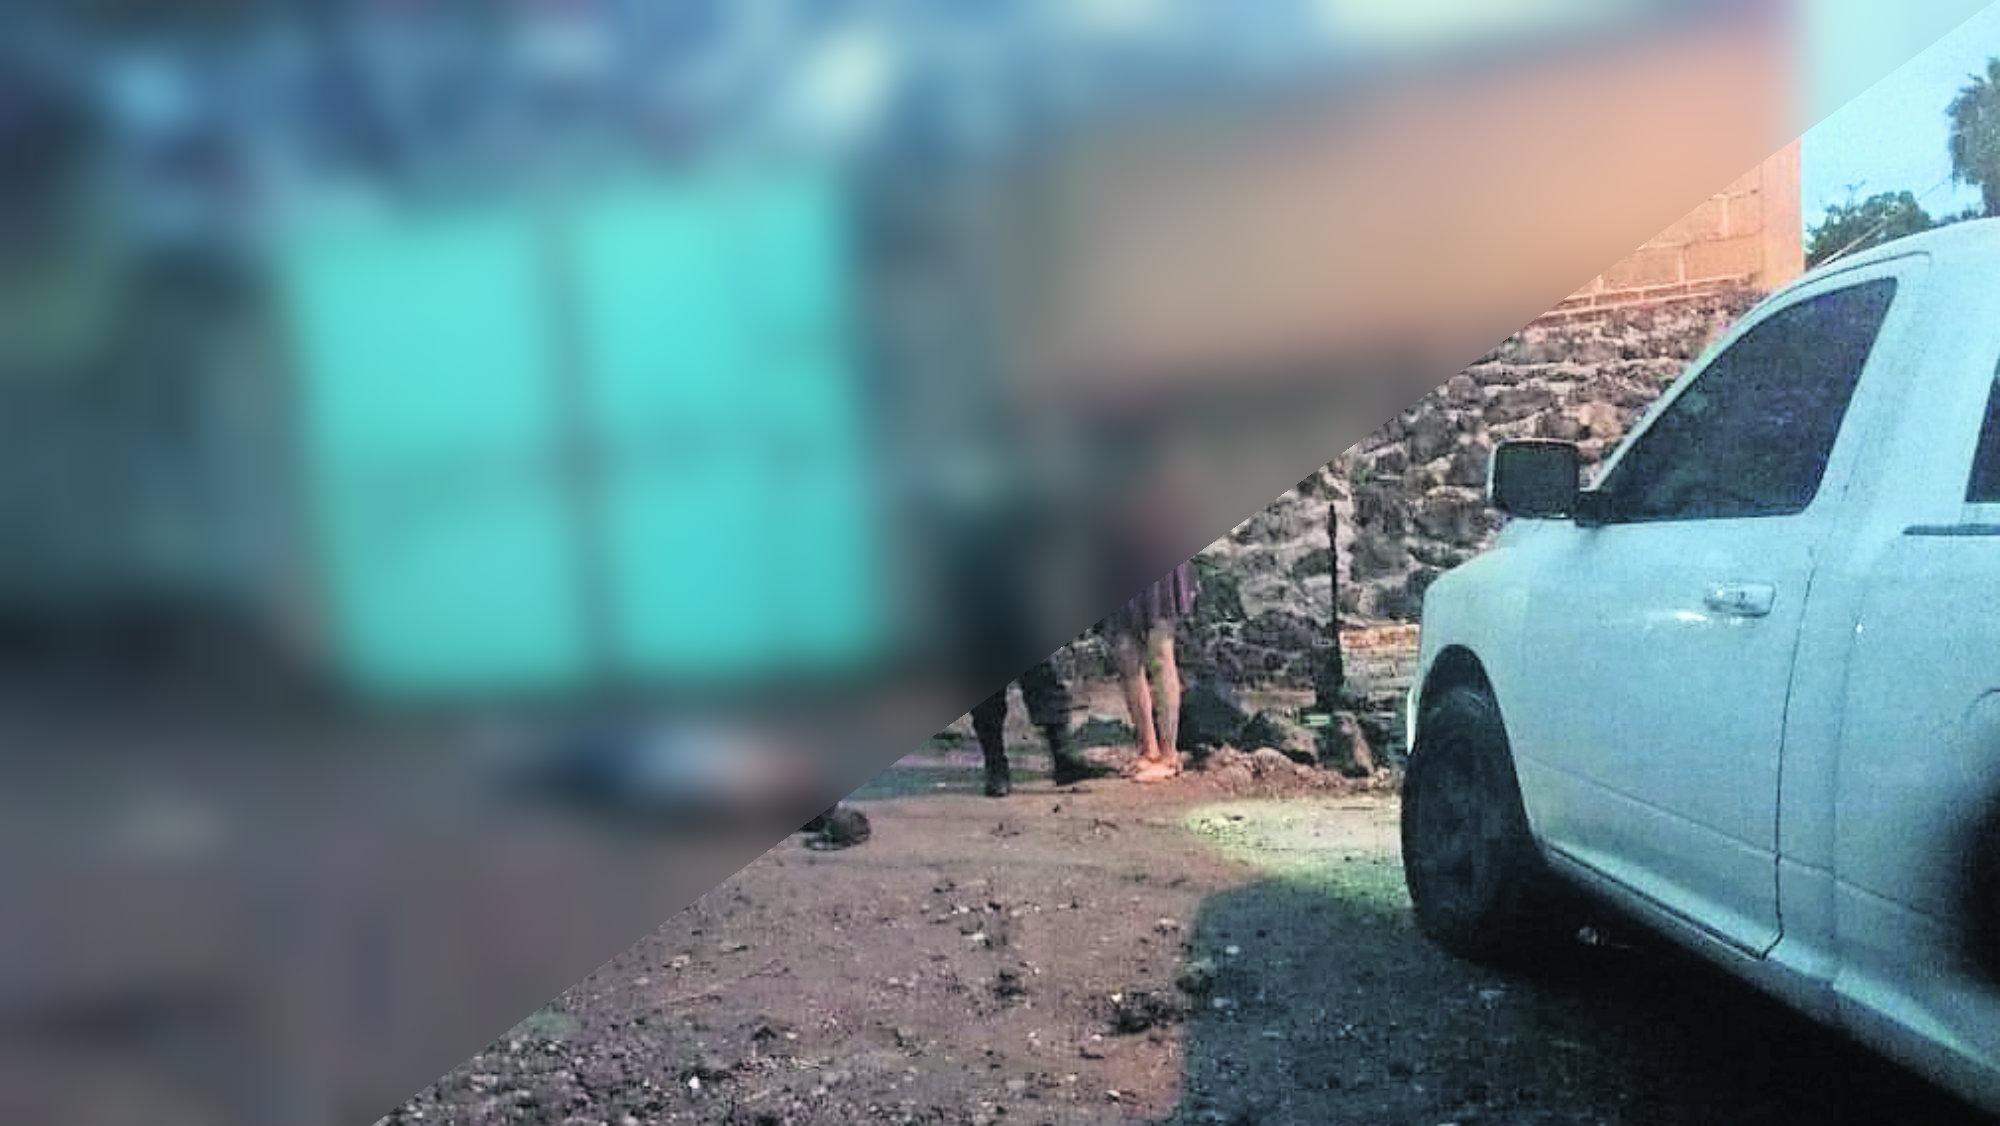 Rafaguean a pareja Ejecutan a hombre Mujer herida Morelos